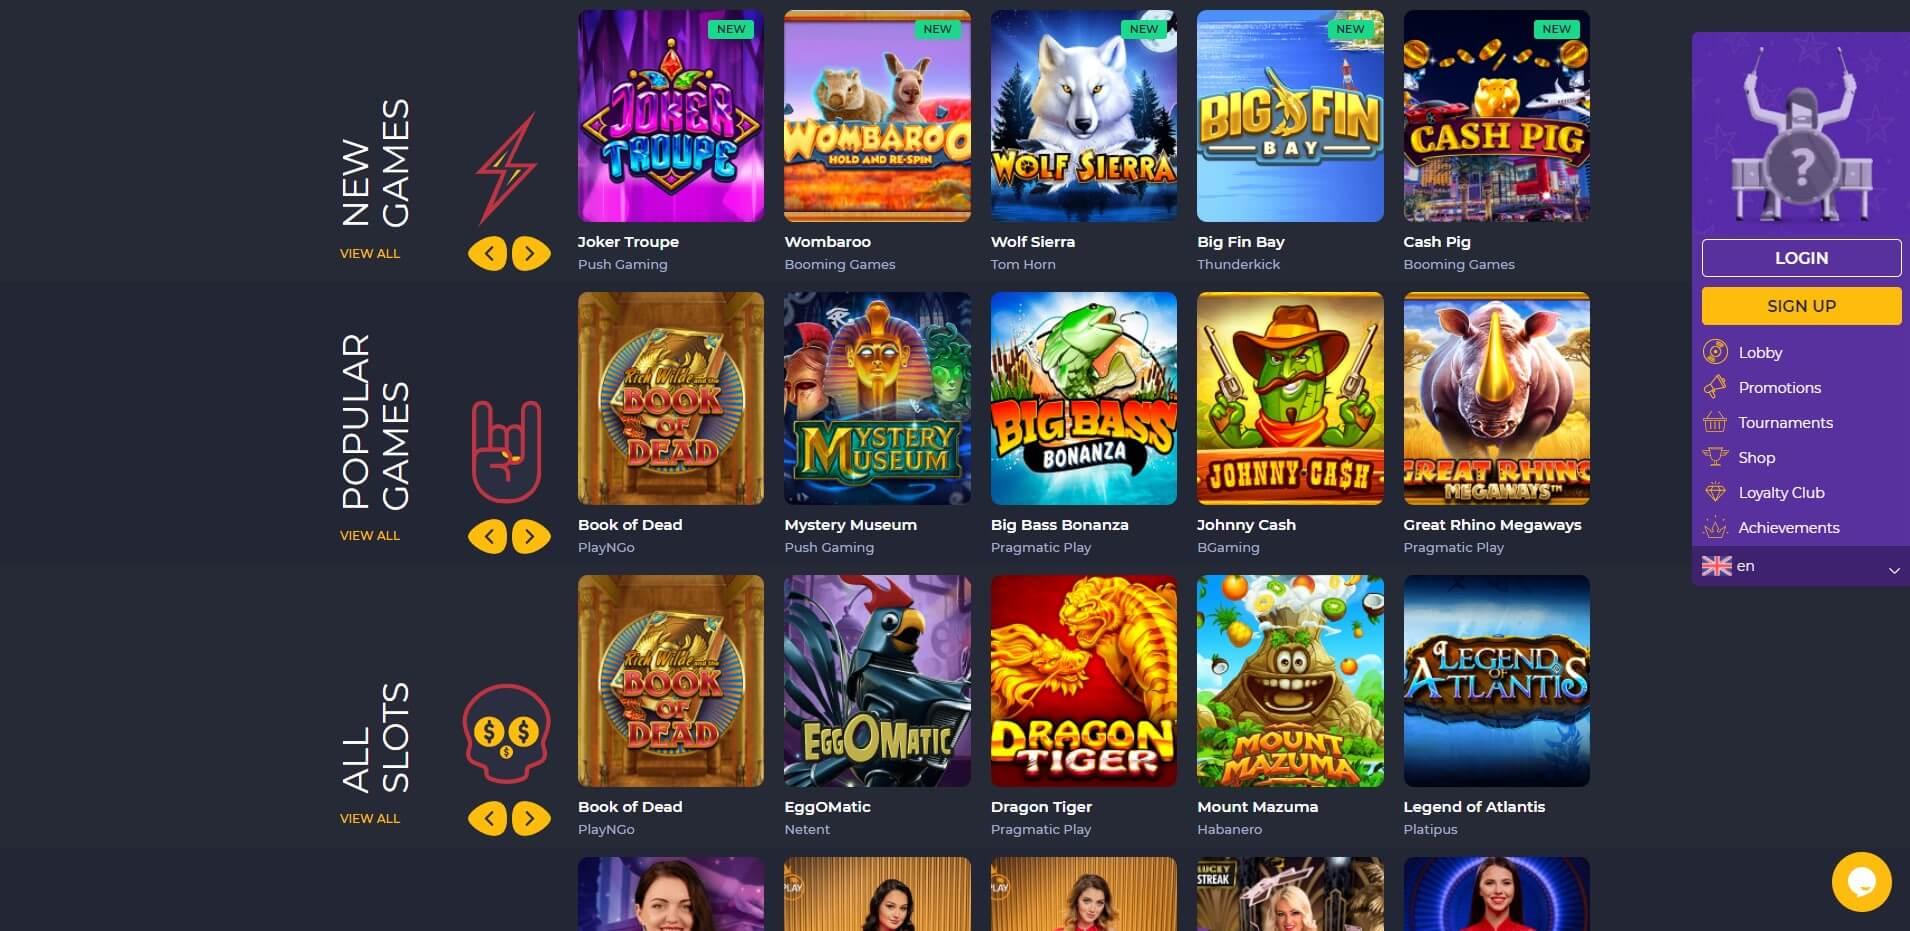 Games at RollingSlots Casino